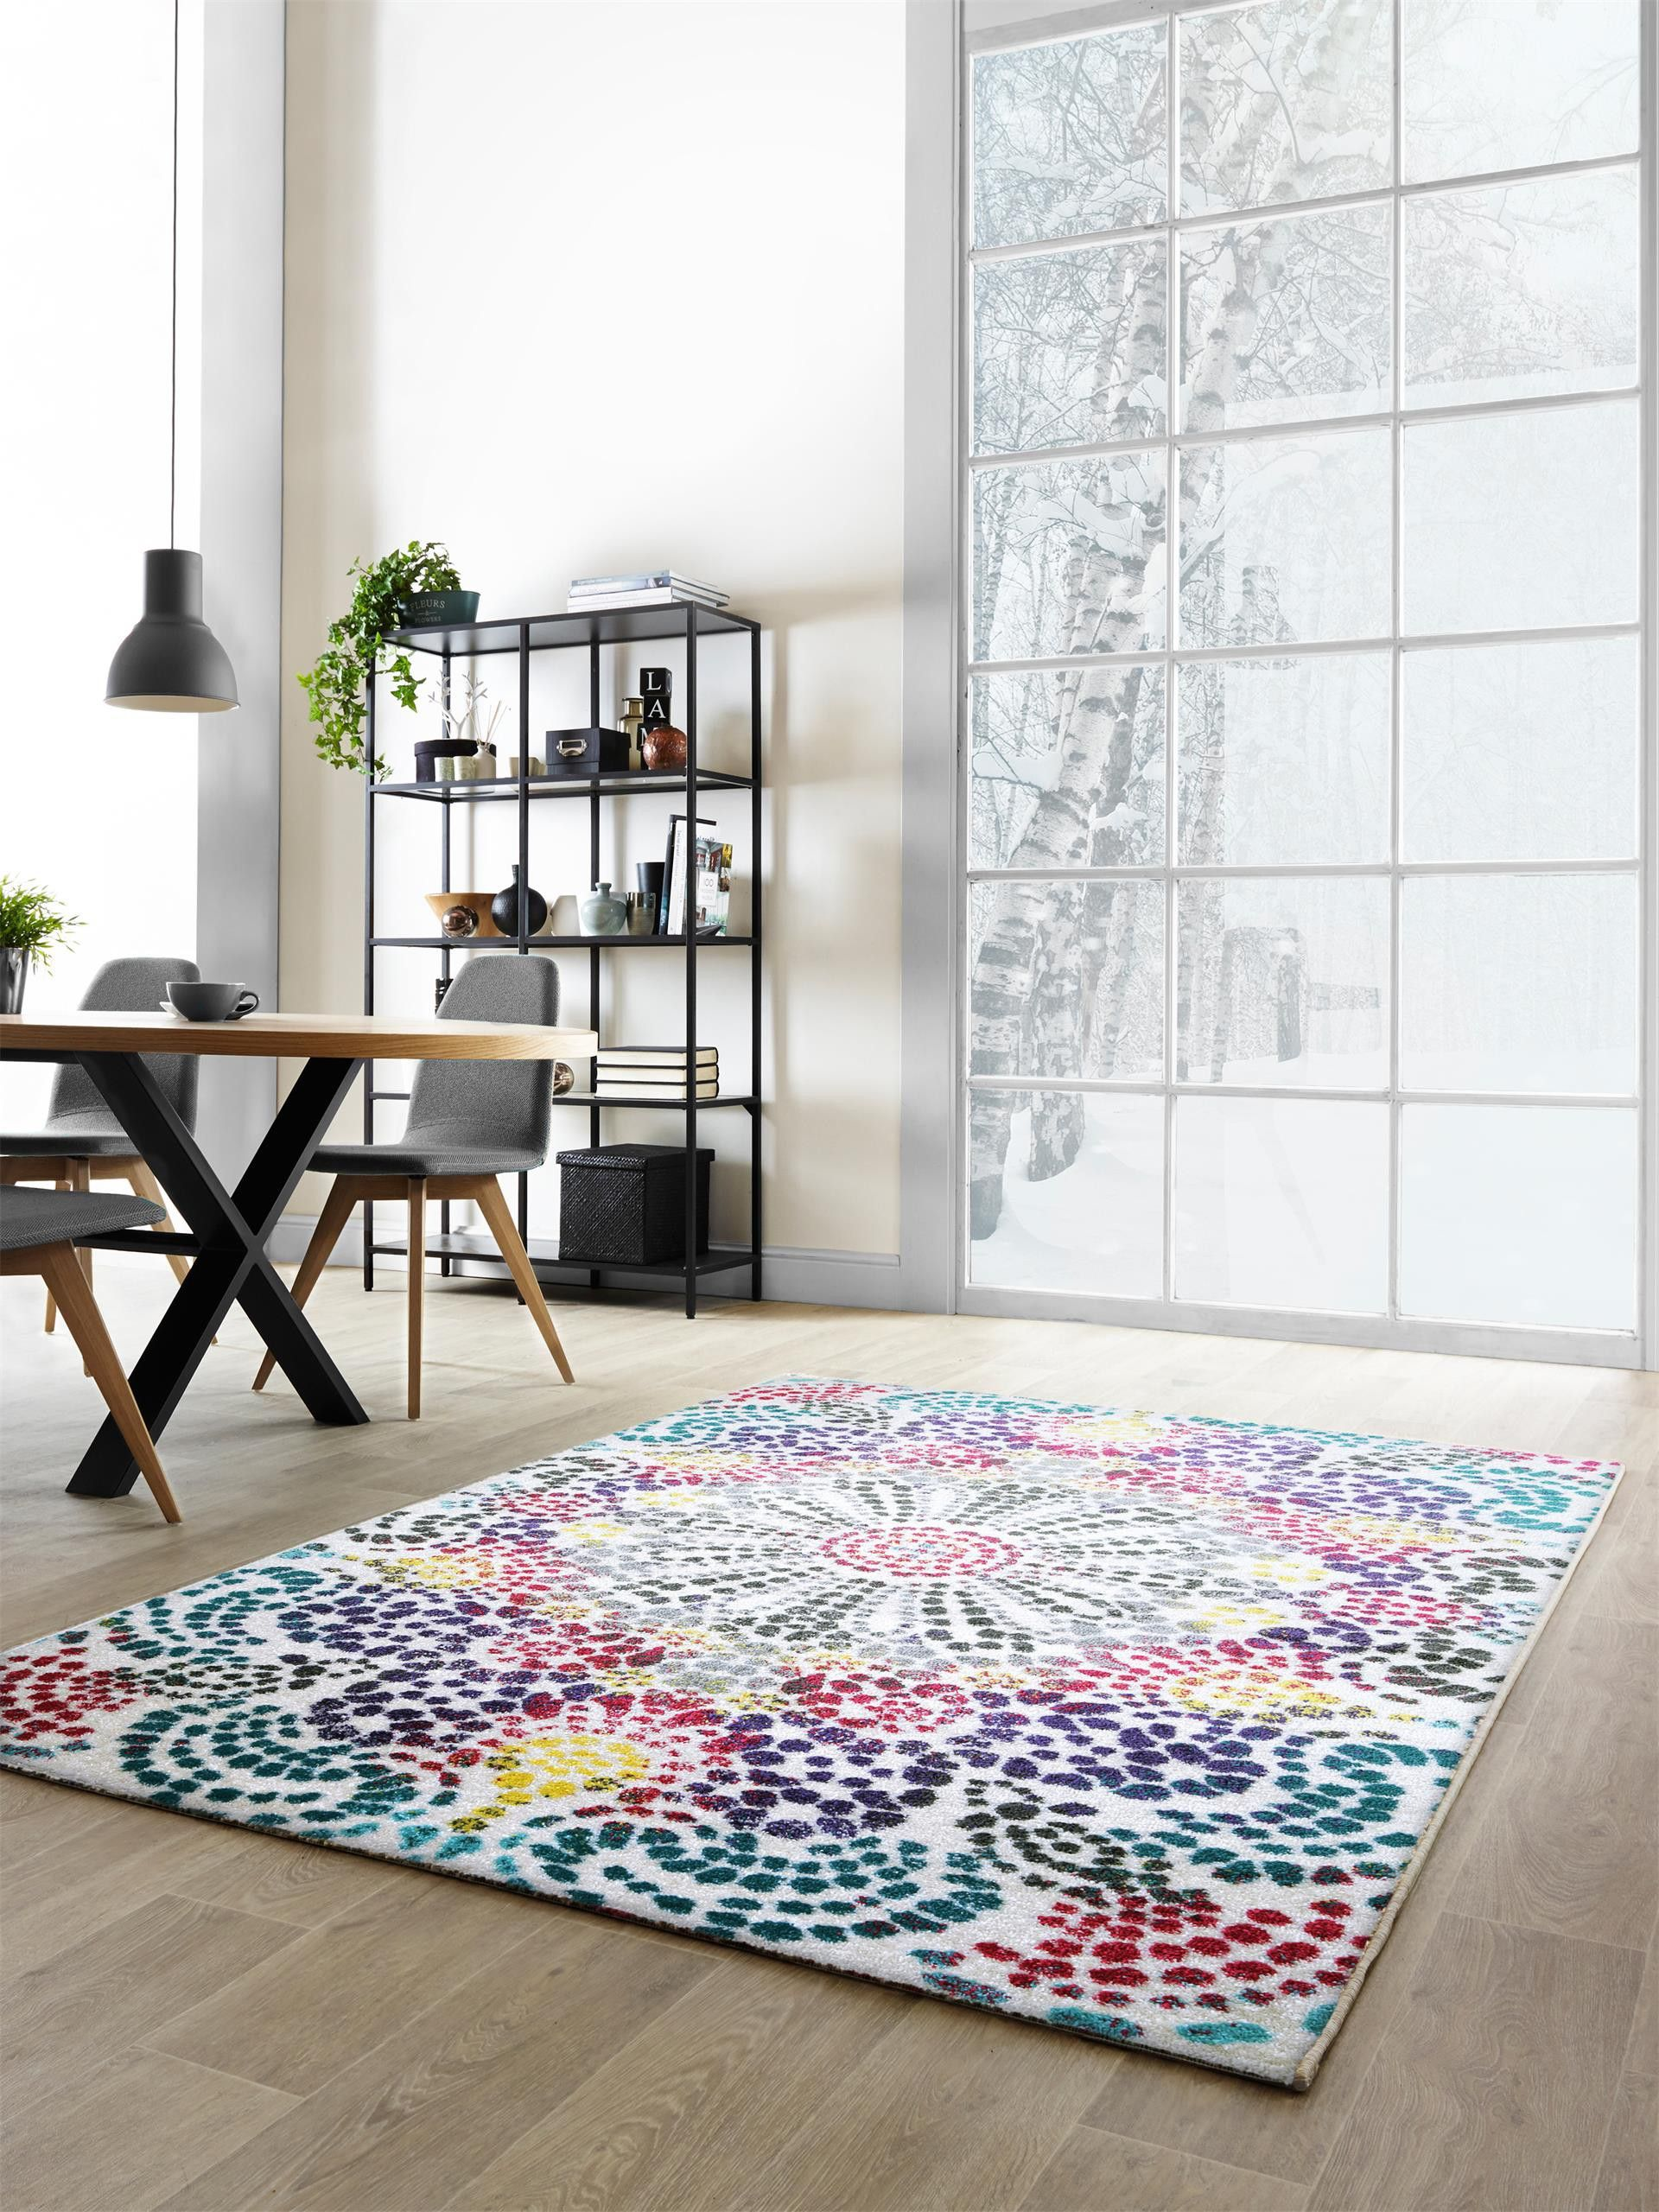 http://www.benuta.de/teppich-arte-mosaic-multicolor.html Farbenprächtiges Design für modernes Wohnen: benuta Teppich Arte Mosaic